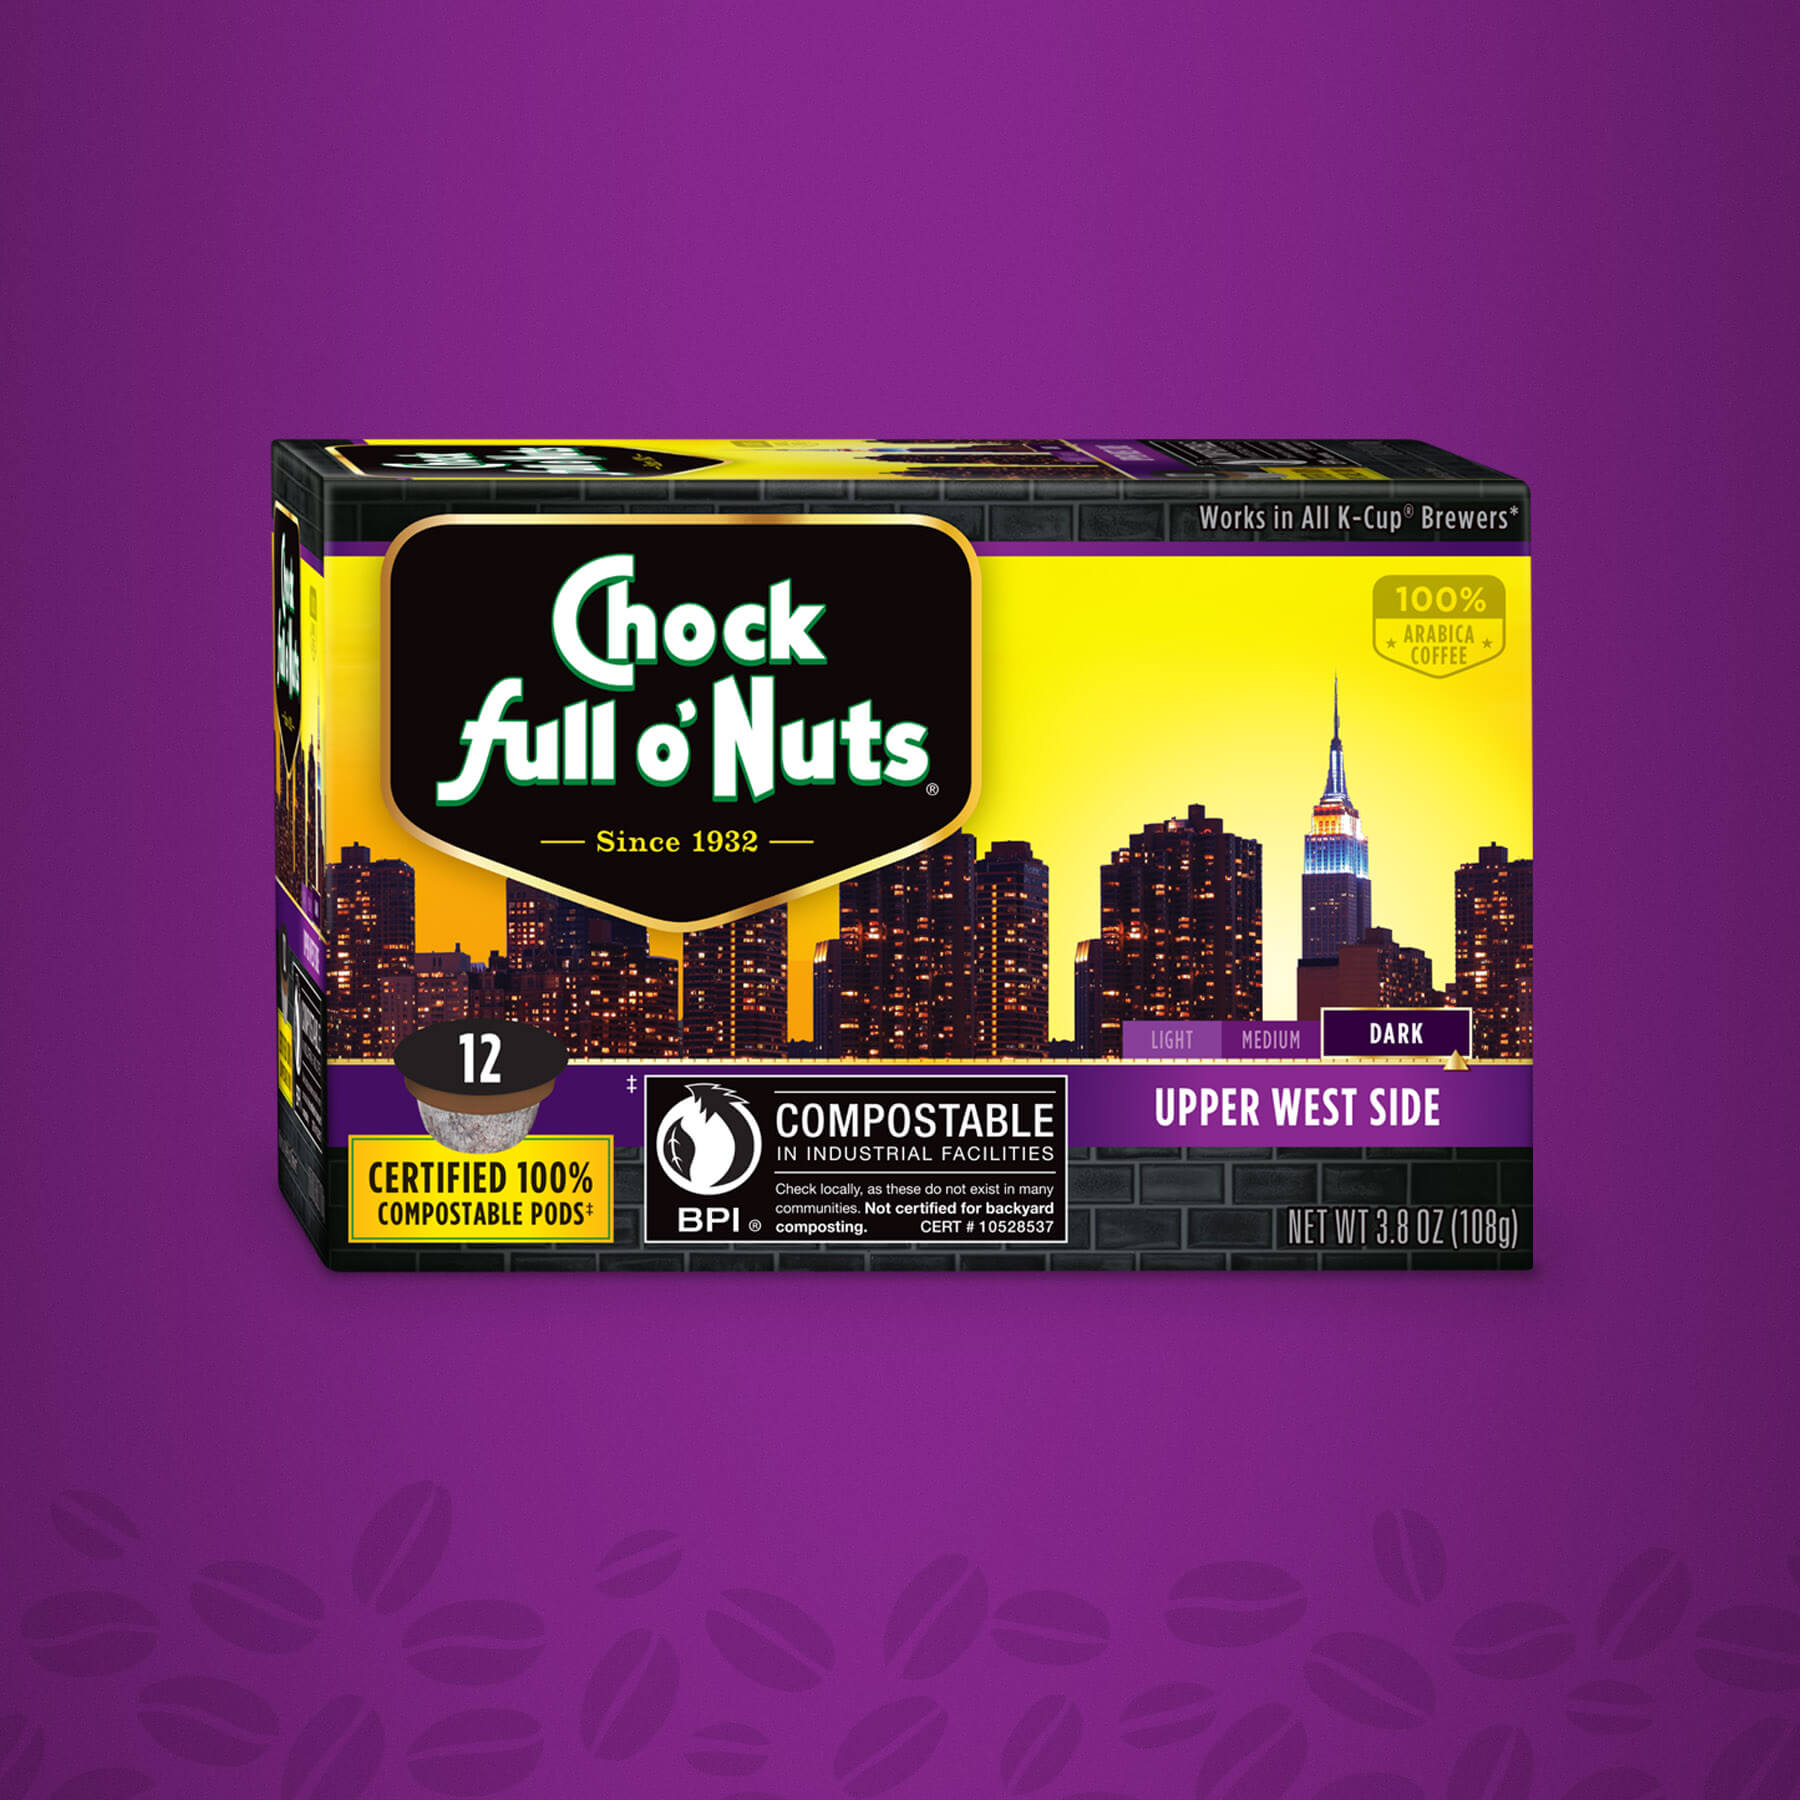 Chock full o' Nuts Upper West Side Package Design